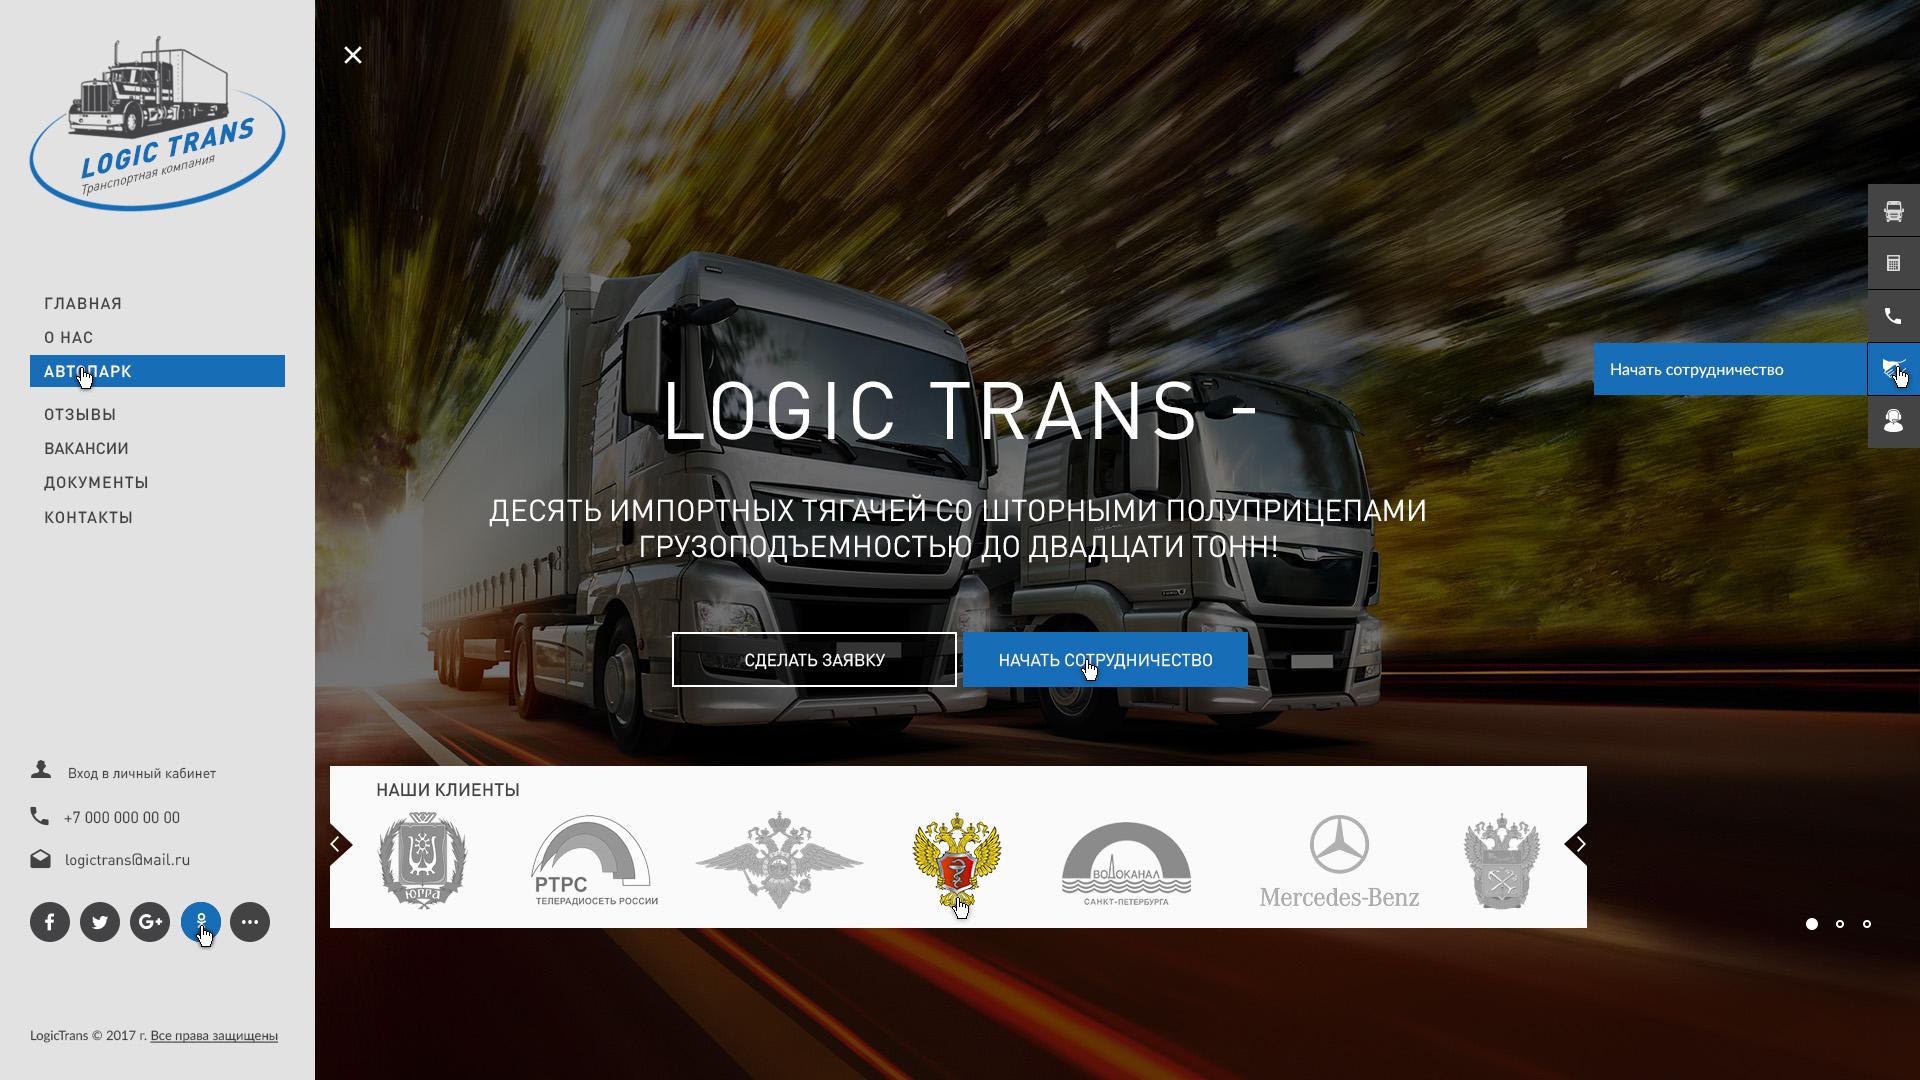 Дизайн сайта транспортно-экспедиторской компании ЛогикТранс фото f_9265a463a4582690.jpg